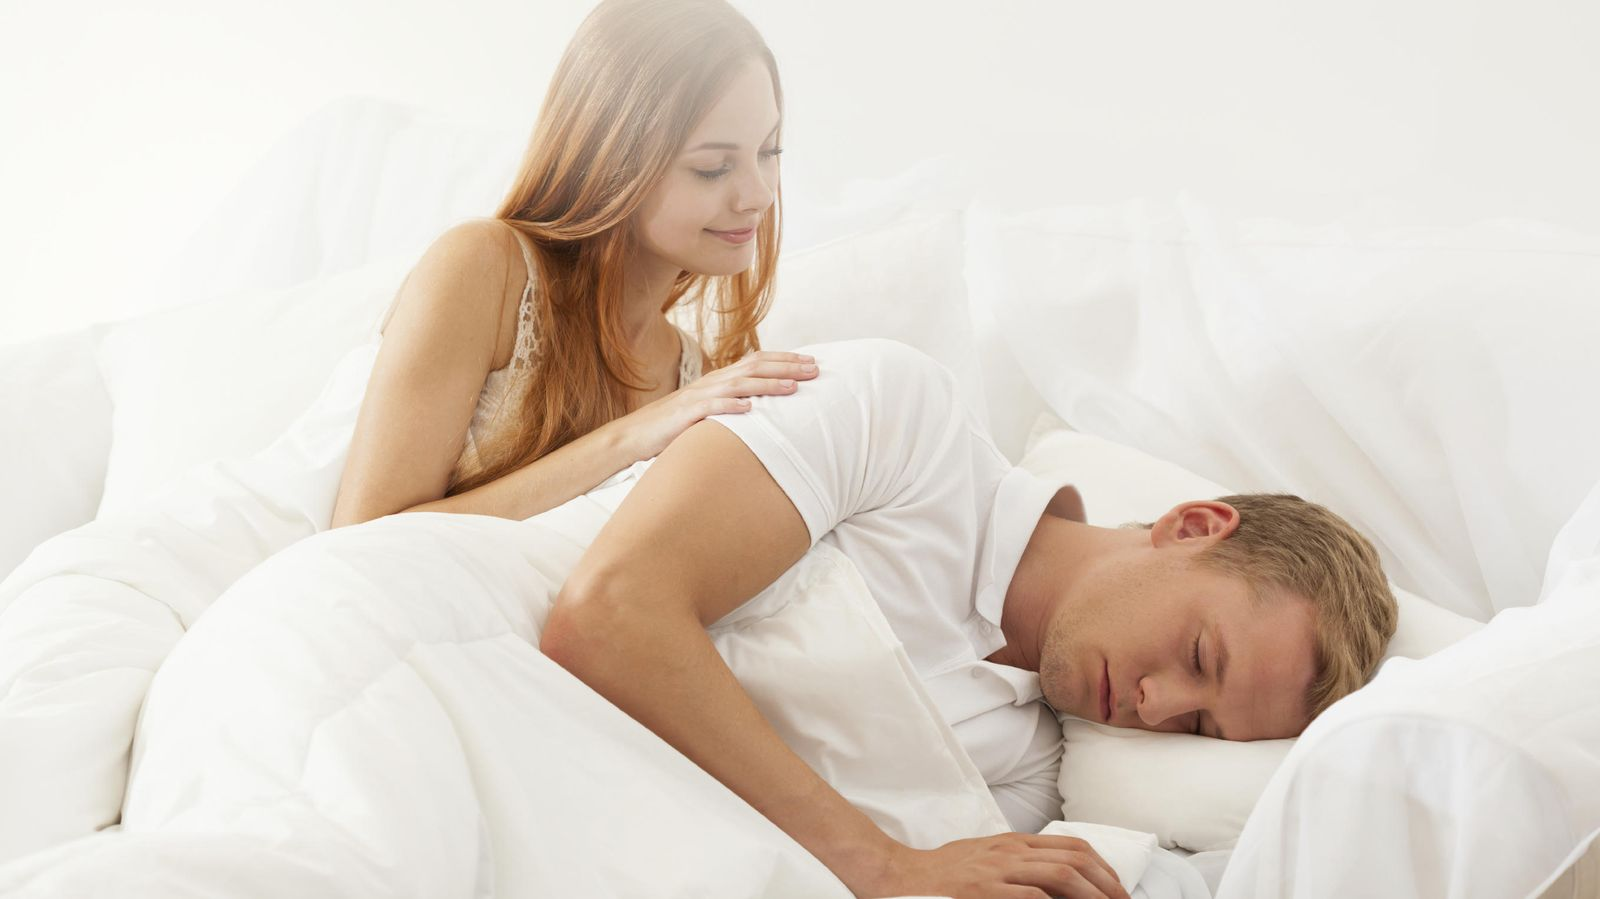 dificultad para vincularse encontrar pareja desnudi chica sexo